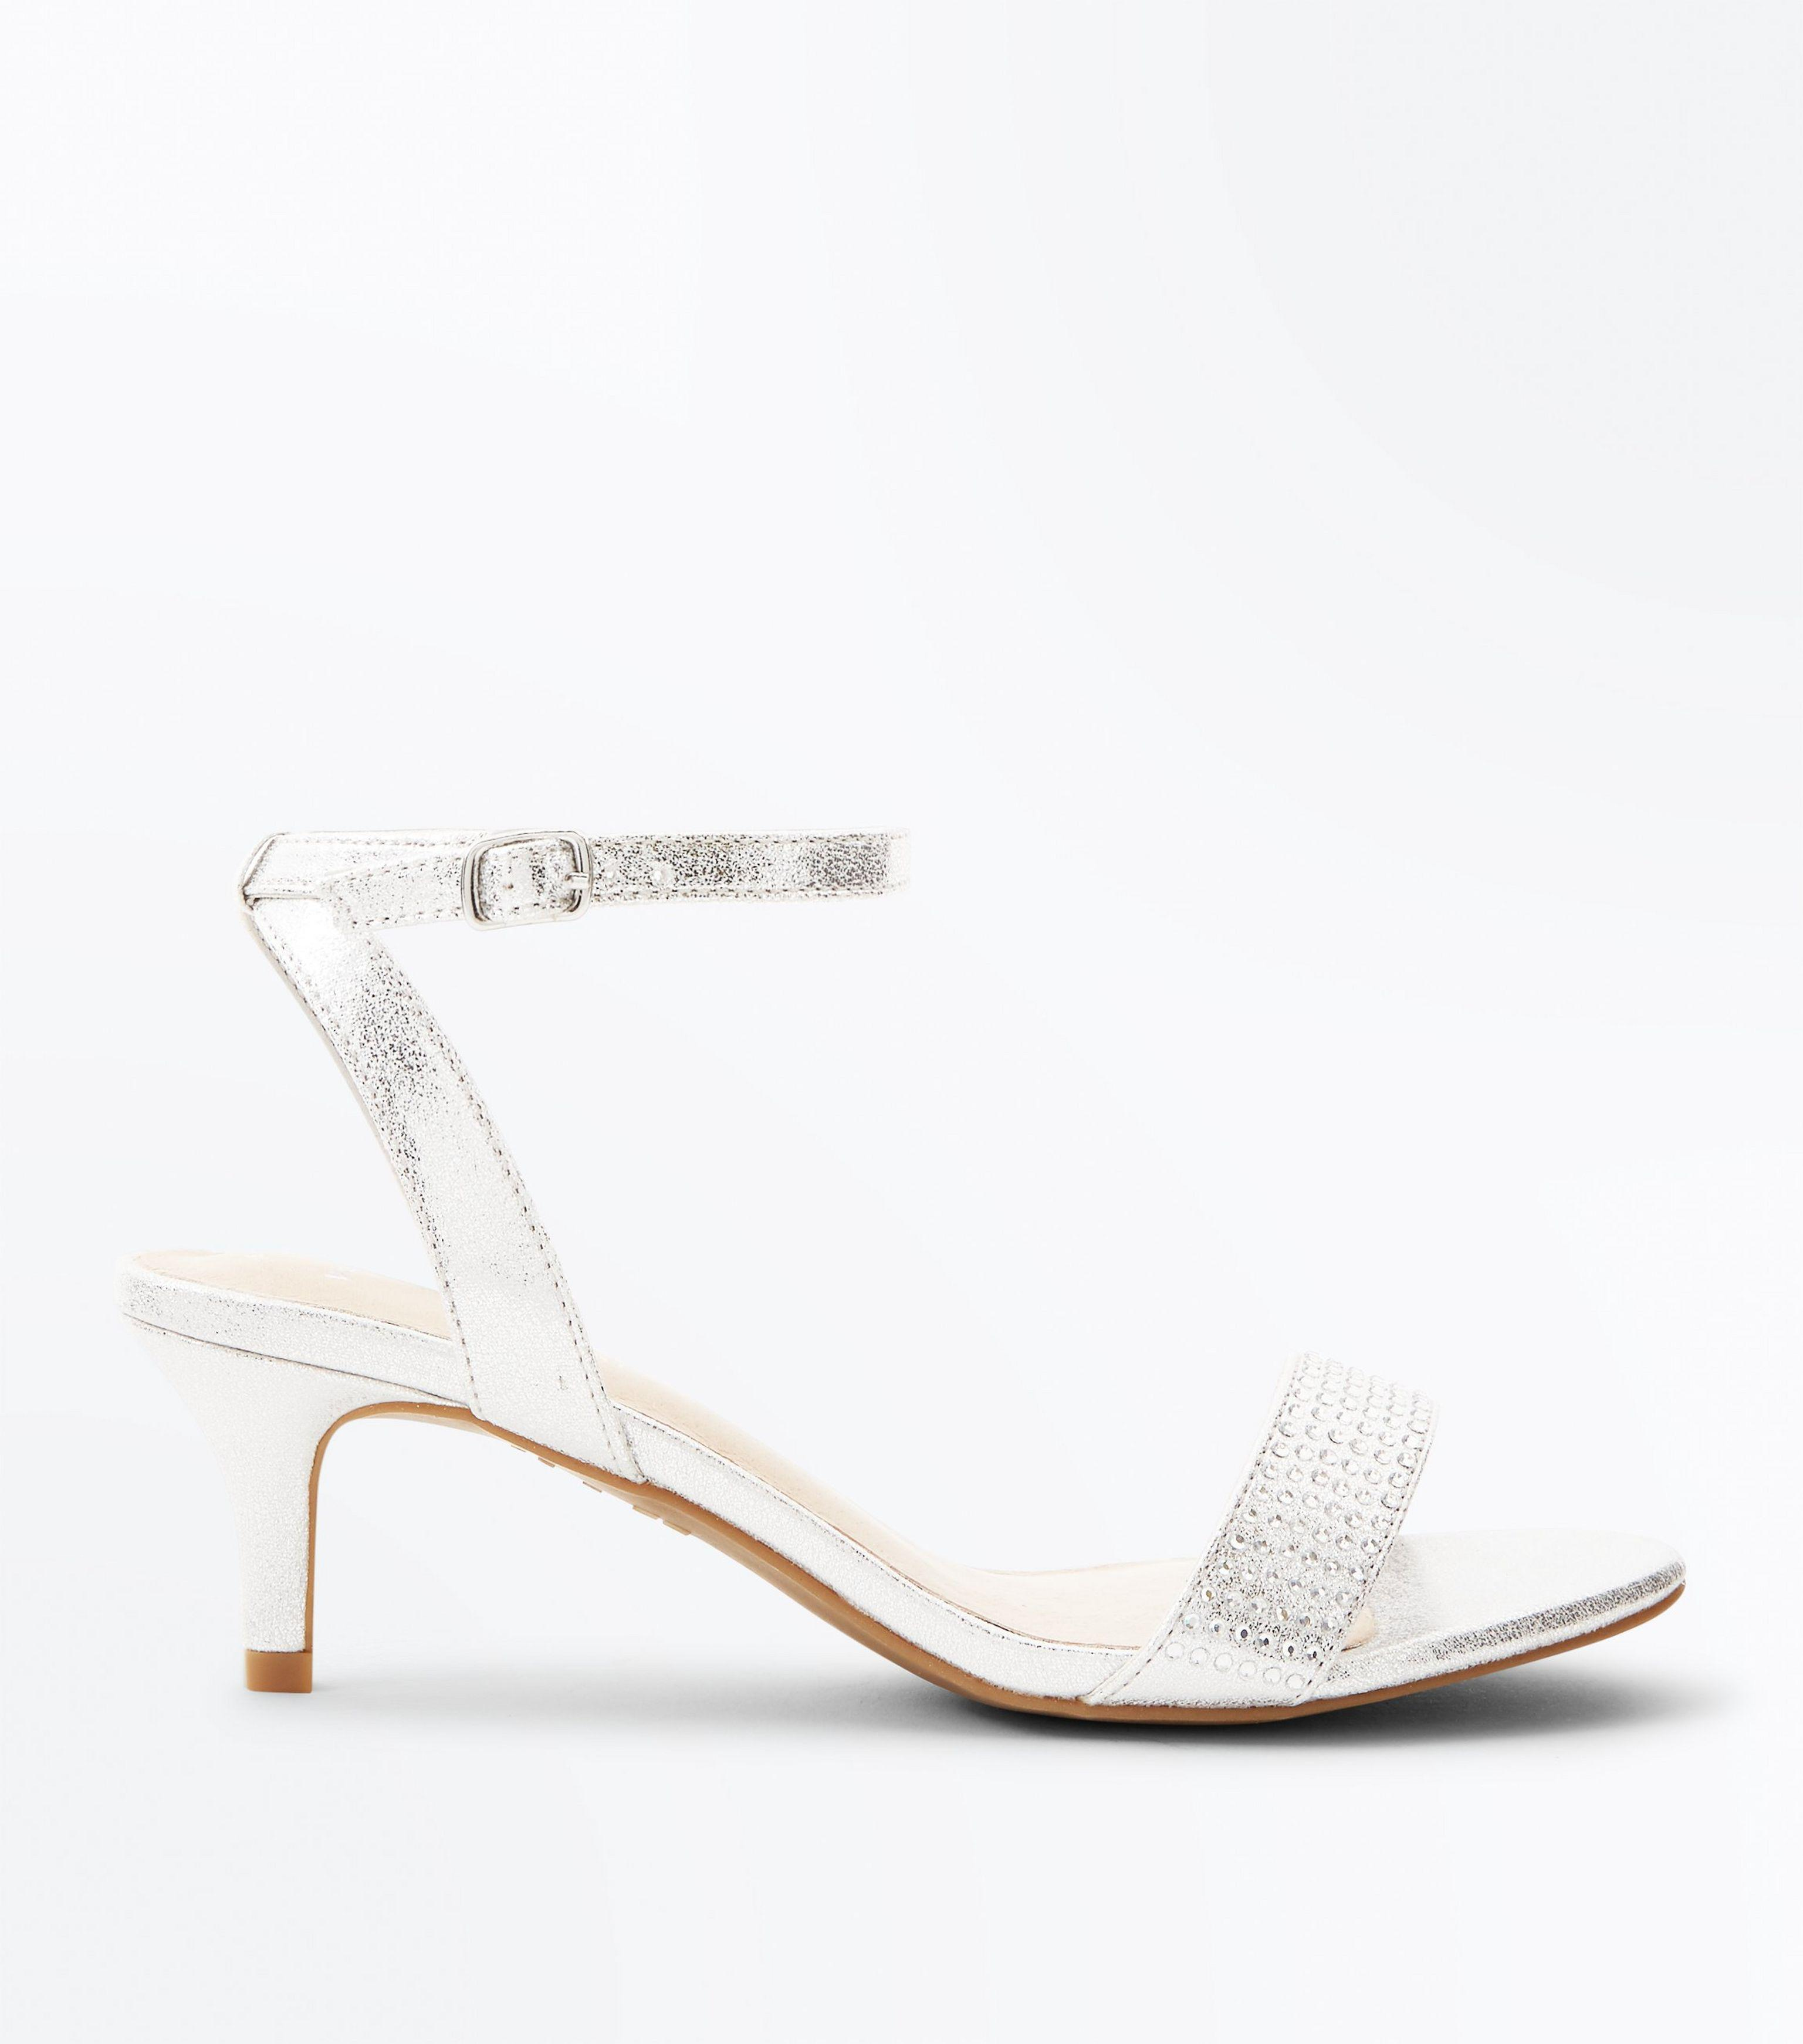 fd1214d2d1ca New Look Wide Fit Silver Comfort Flex Diamanté Strap Kitten Heels in ...